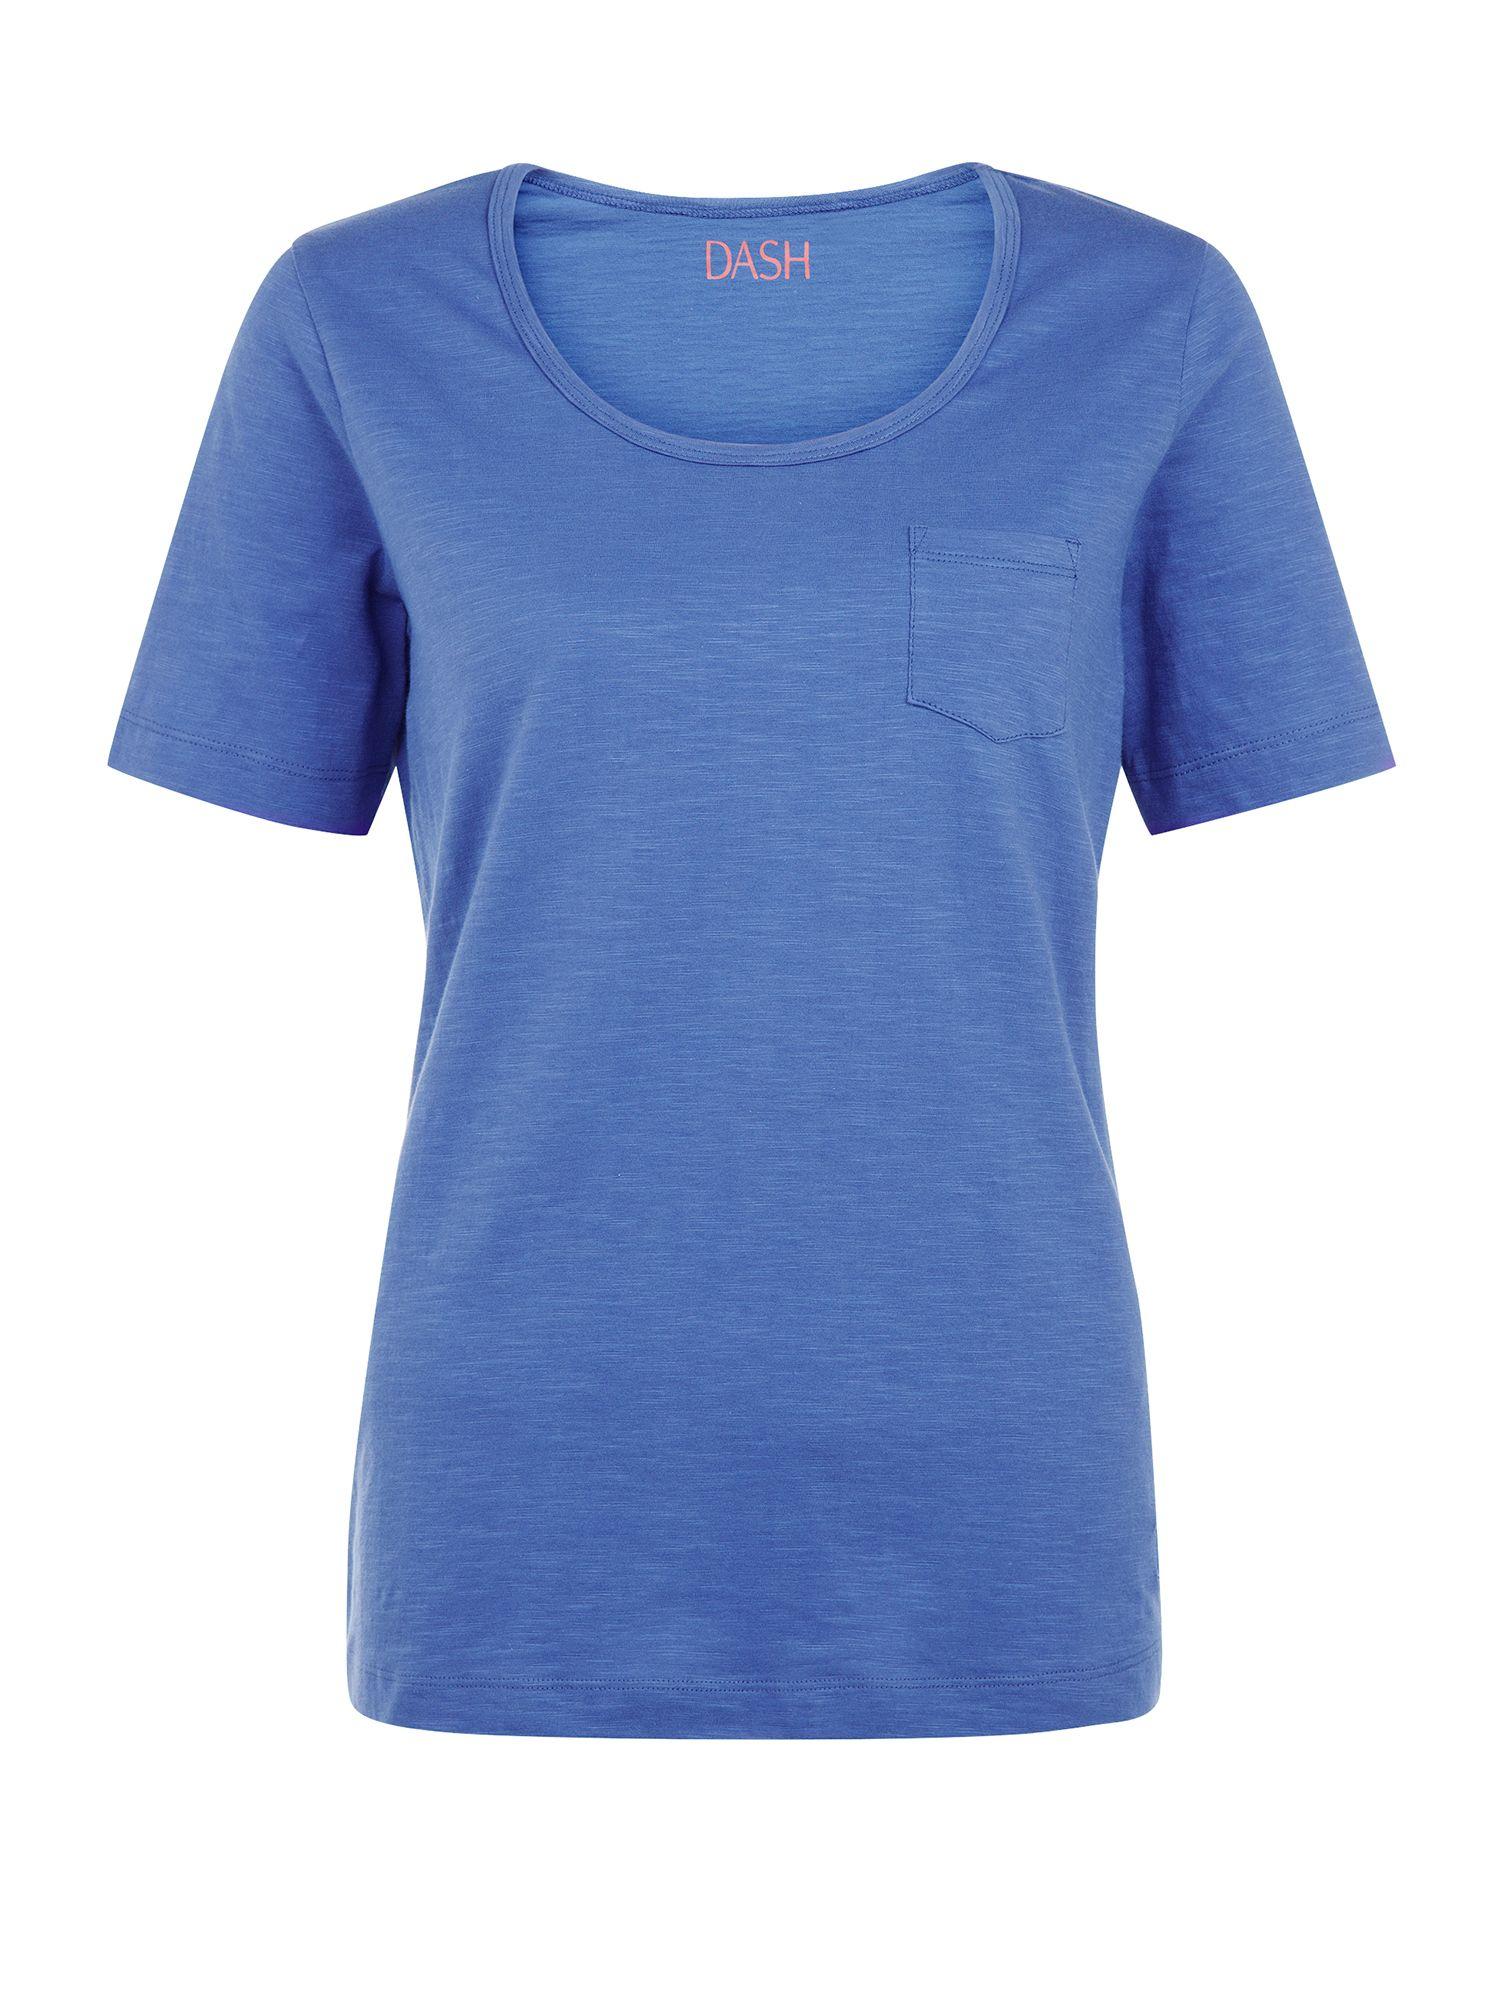 Dash patch pocket slub t shirt in blue bright blue lyst for What is a slub shirt